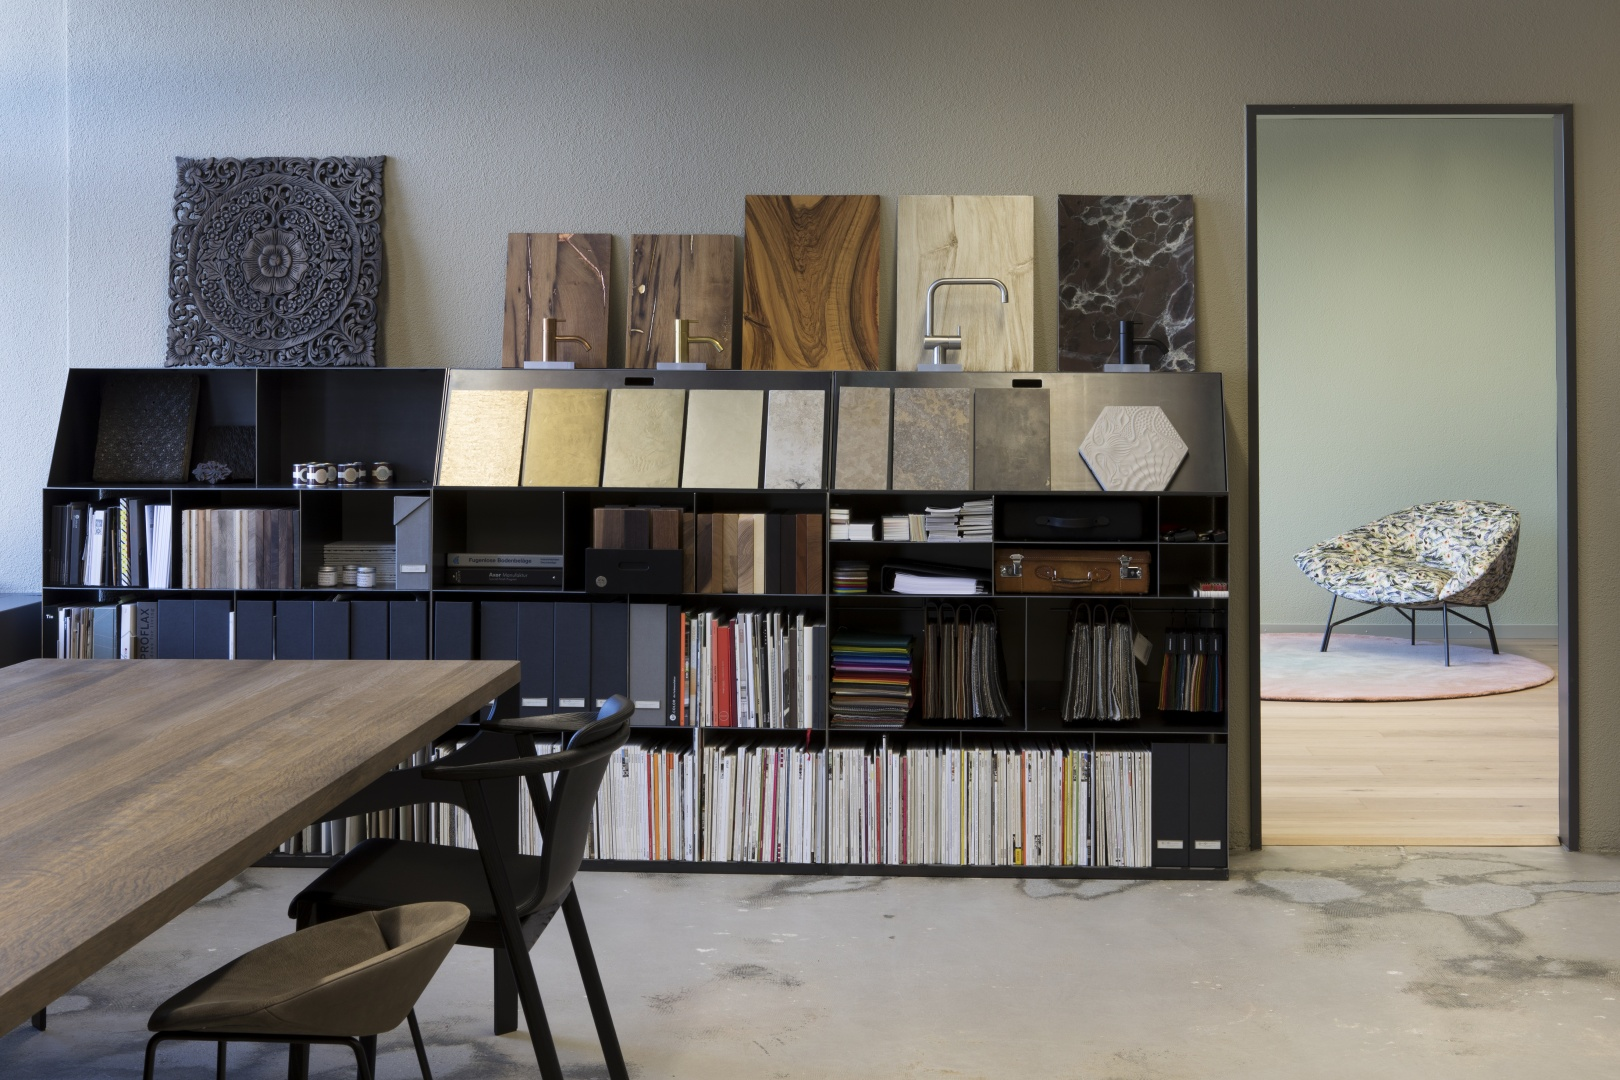 materialbibliothek_goodinteriors_5 © good interiors gmbh / Sibylle Meier